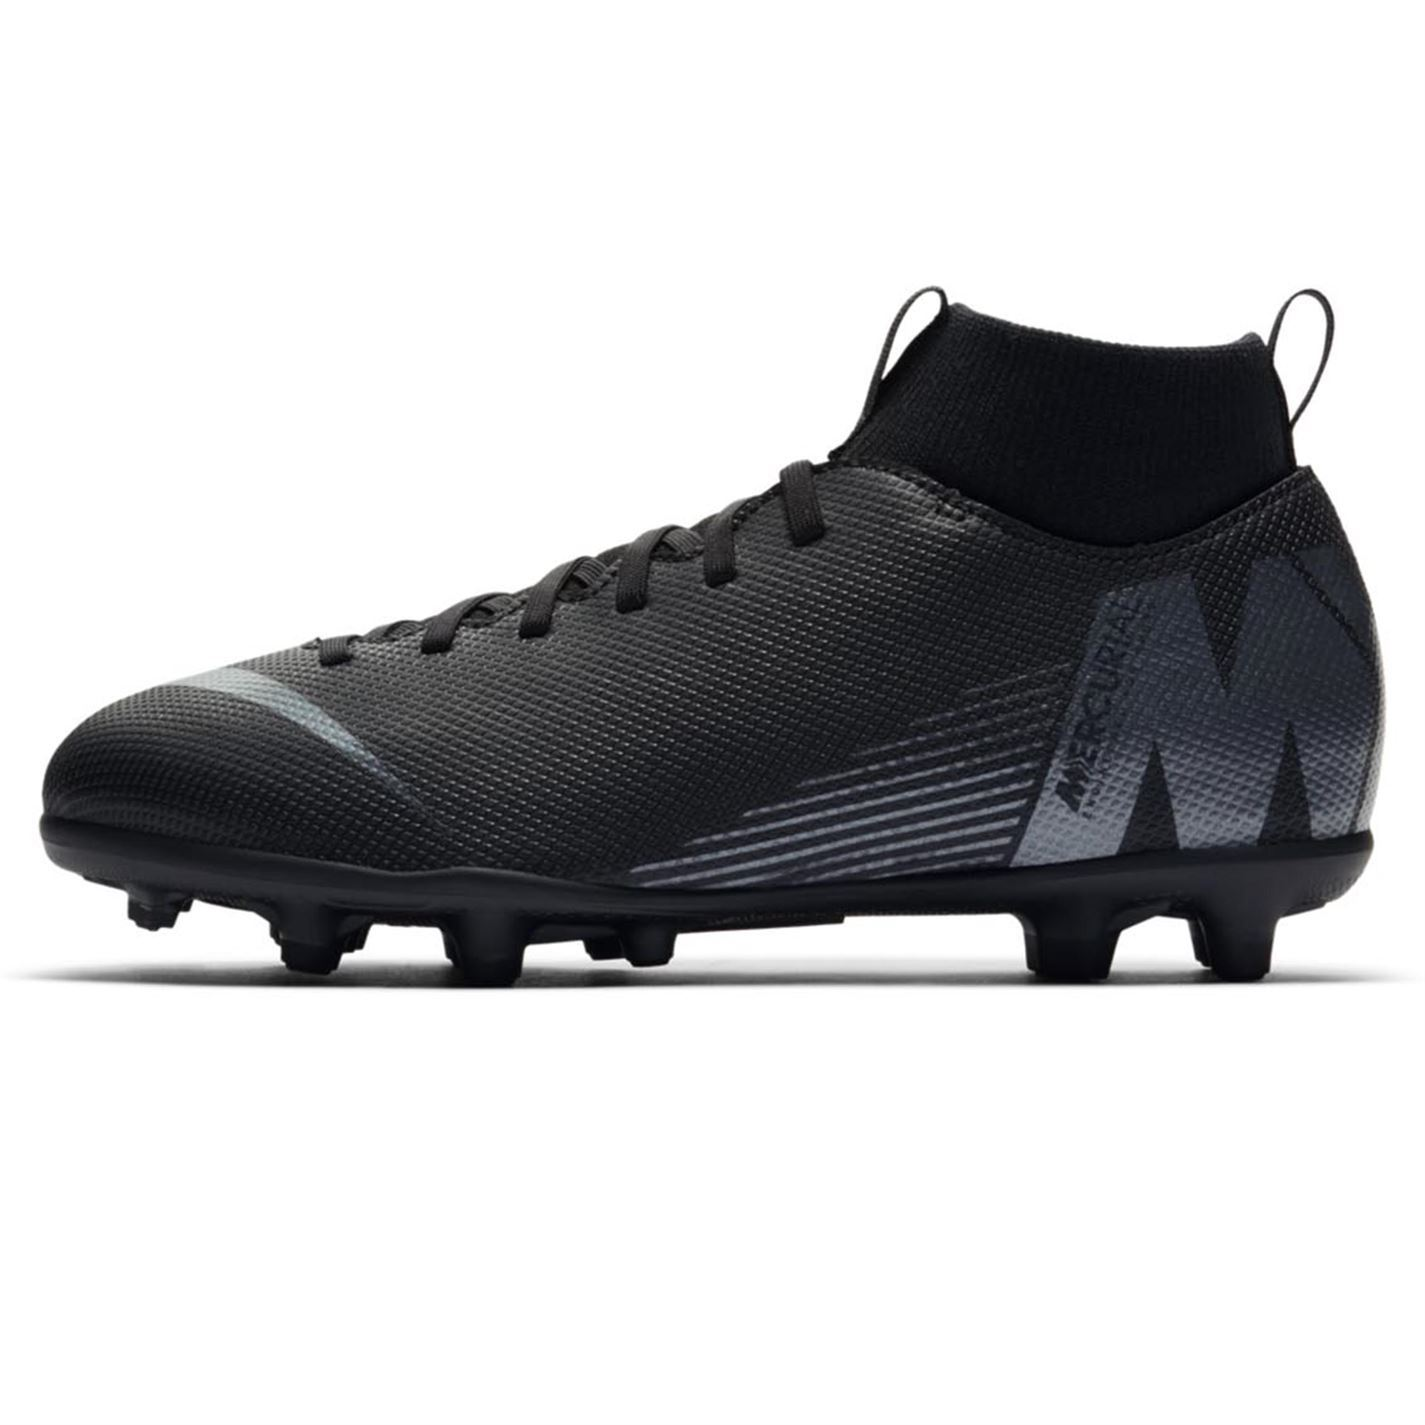 Nike-MERCURIAL-SUPERFLY-Club-DF-TERRA-FERMA-SCARPE-DA-CALCIO-JUNIOR-CALCIO-Cunei miniatura 6